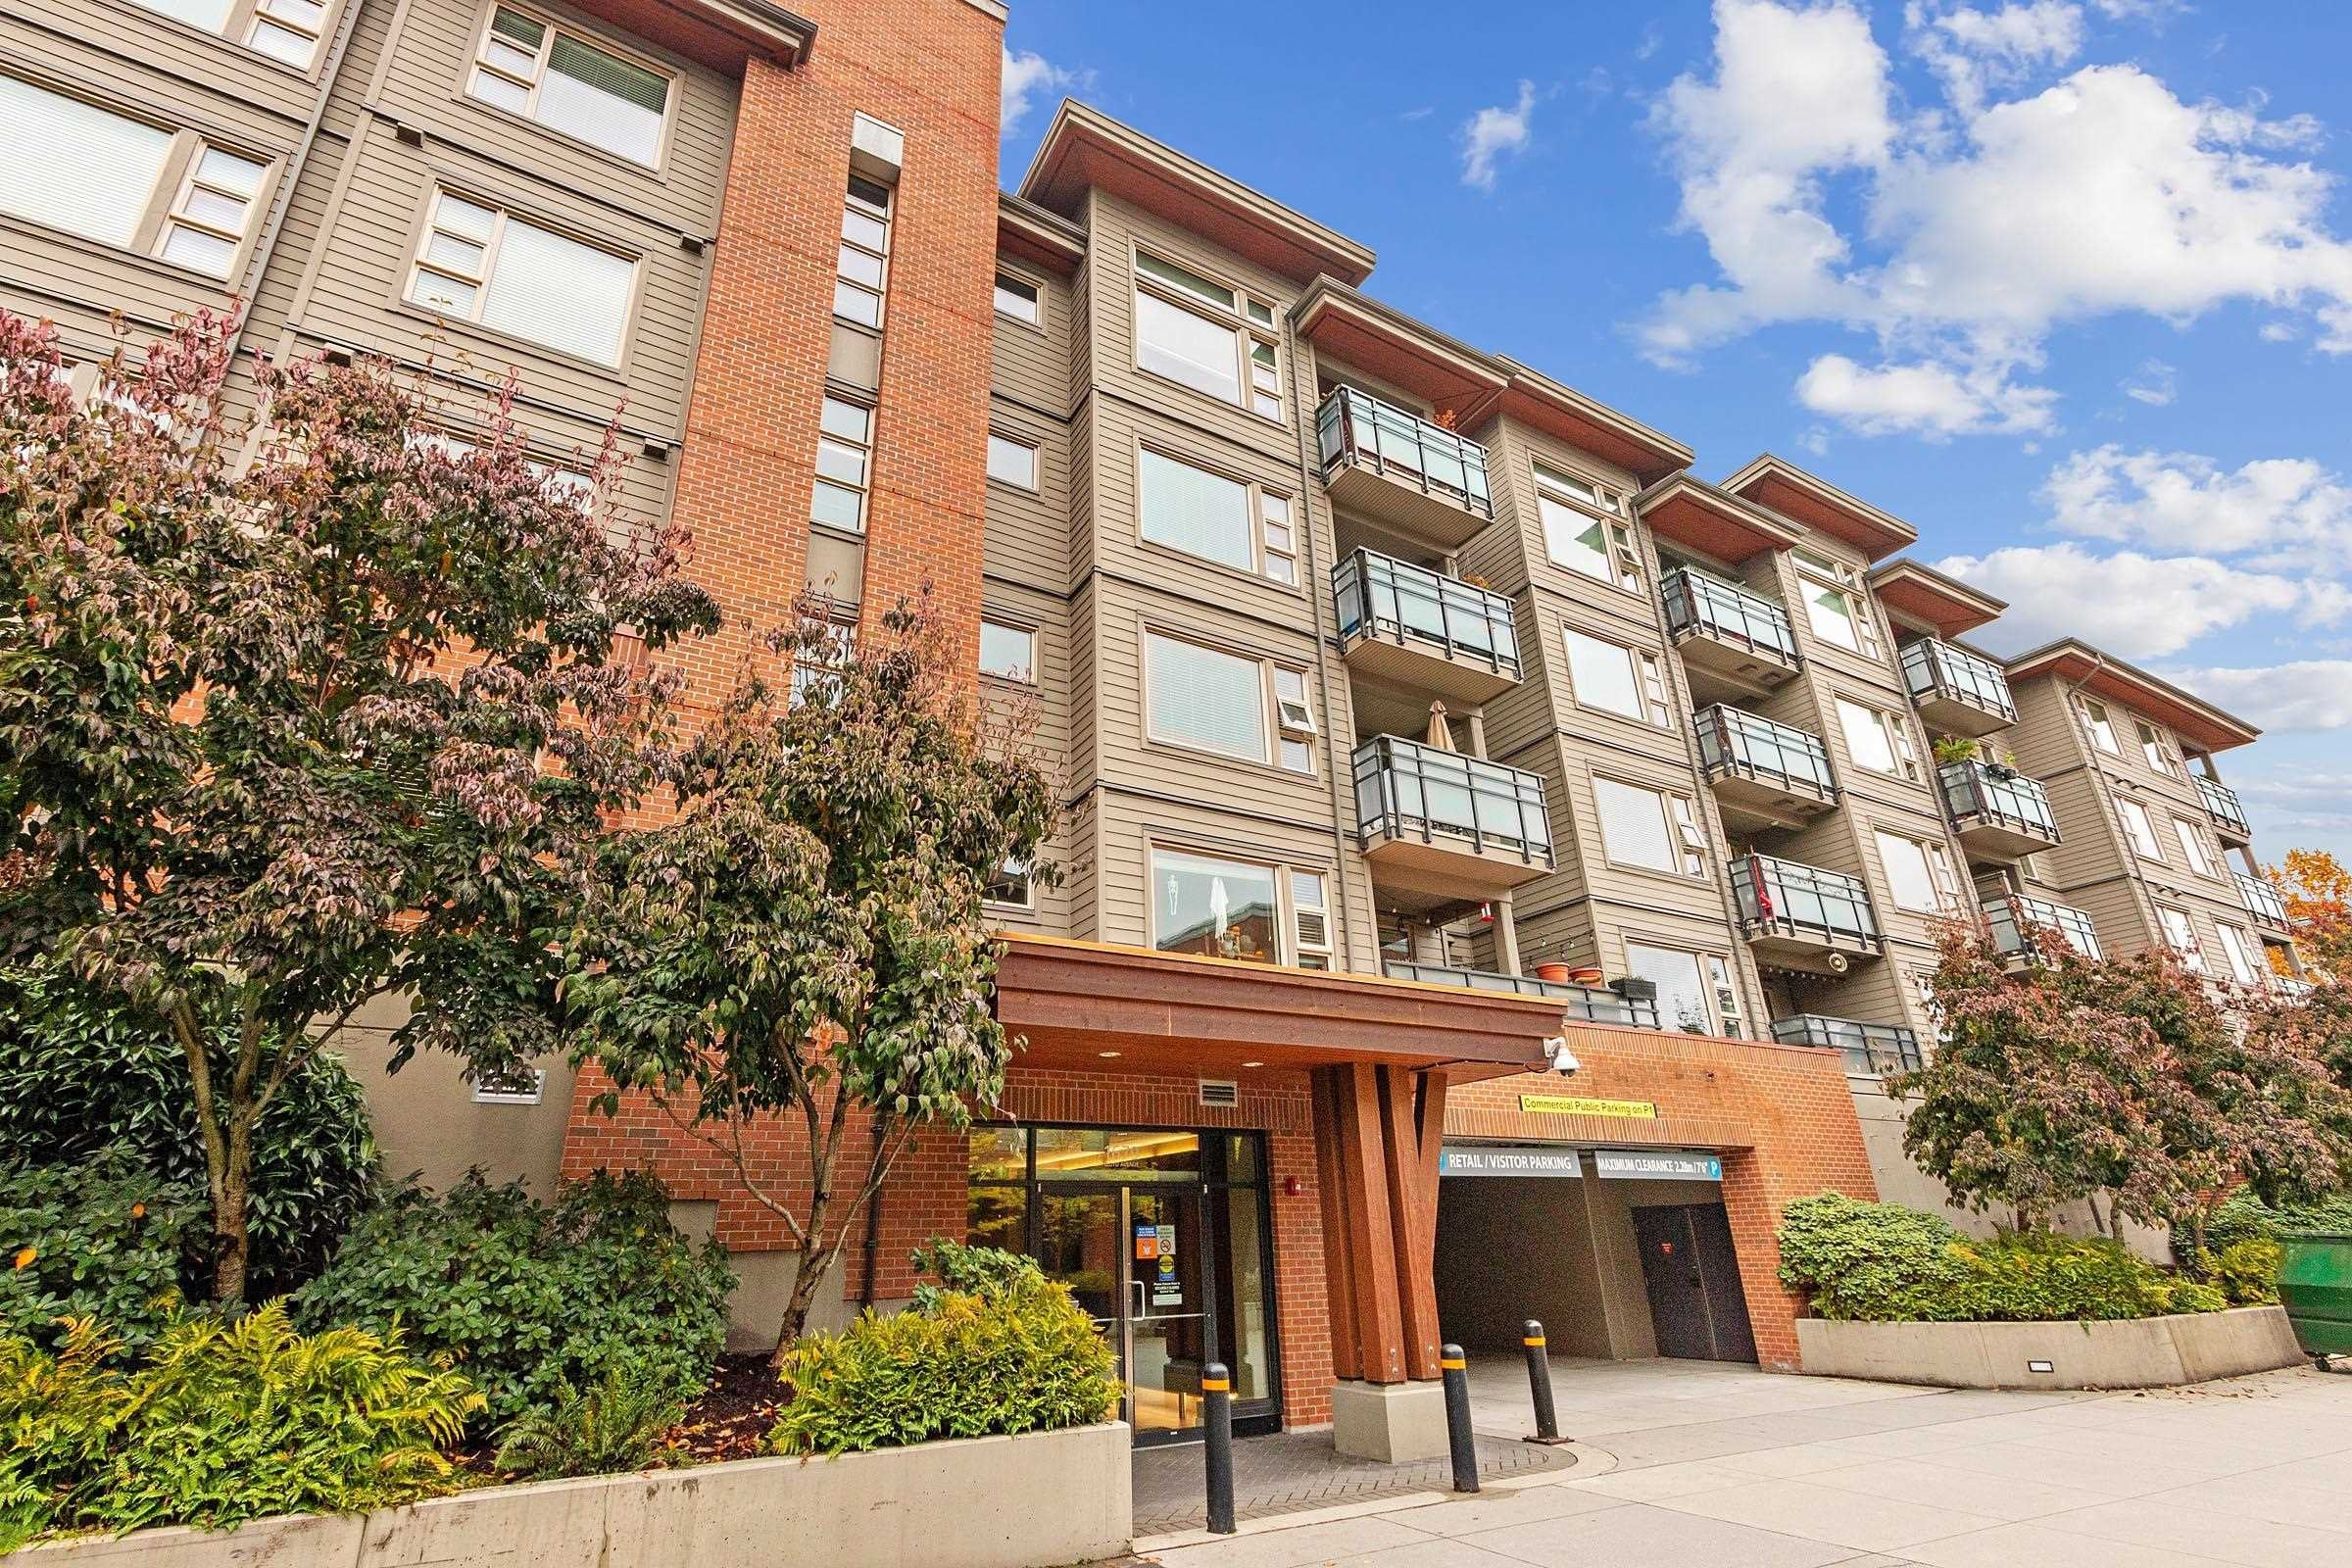 205 1679 LLOYD AVENUE - Pemberton NV Apartment/Condo for sale, 2 Bedrooms (R2627226) - #1